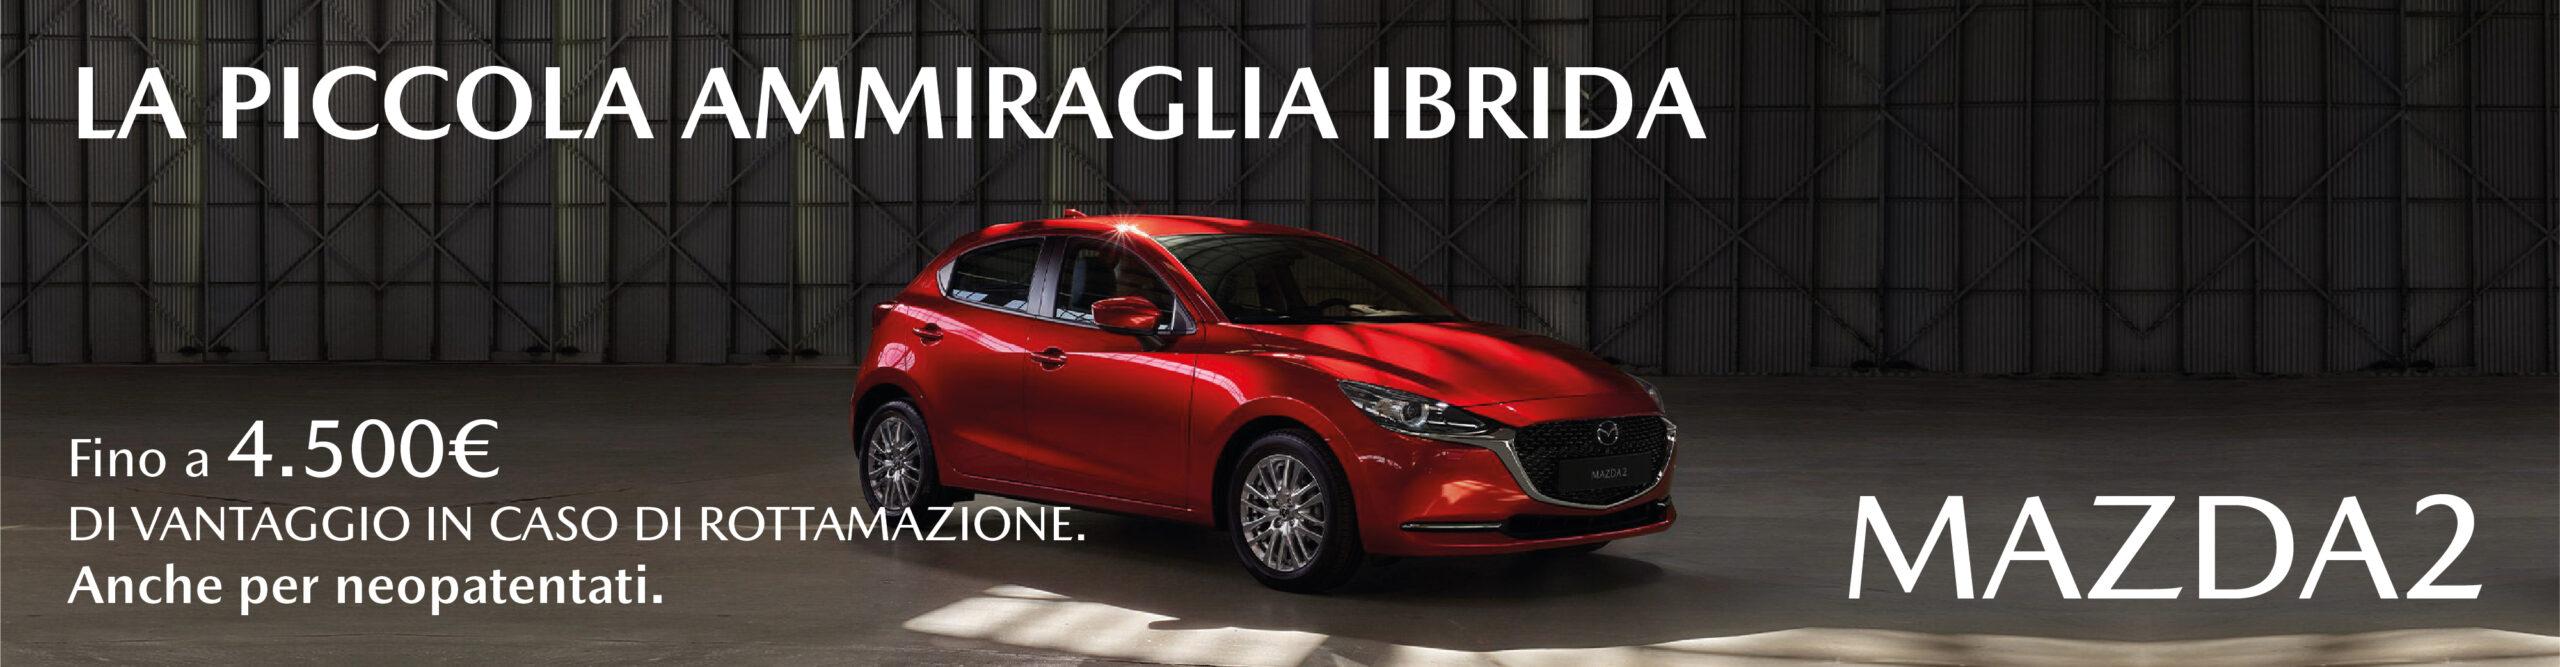 Mazda 2 Hybrid 4.500€ di vantaggi